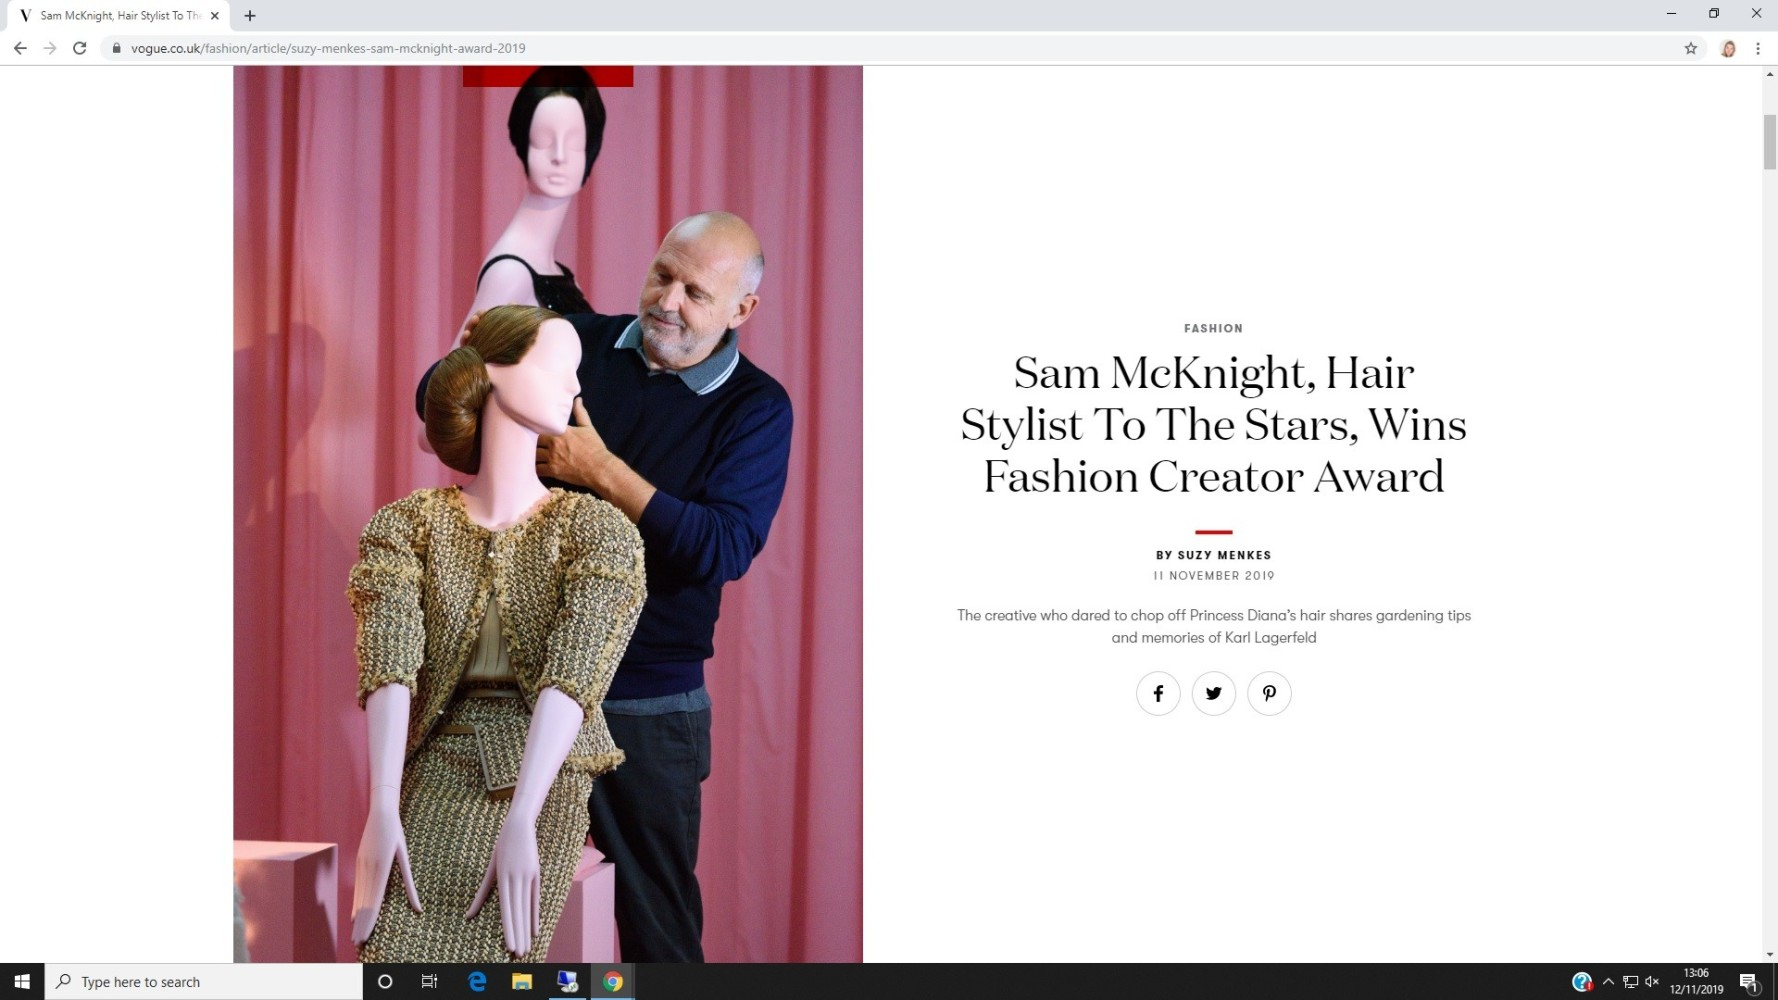 BRITISH VOGUE: SAM MCKNIGHT FASHION CREATOR AWARD